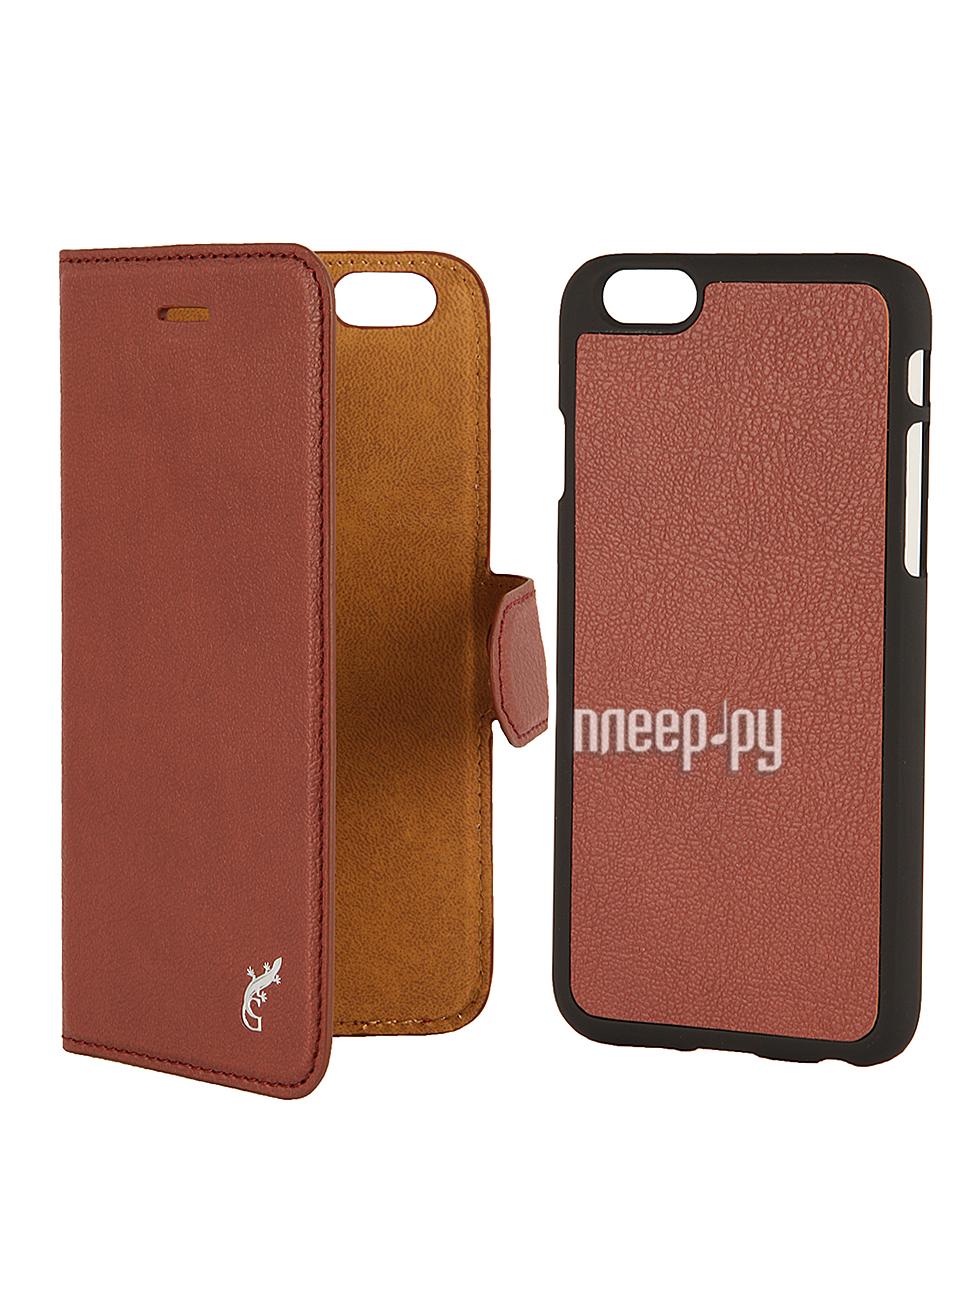 Аксессуар Чехол G-Case Prestige 2 в 1 for iPhone 6 4.7-inch Brown GG-489  Pleer.ru  1250.000